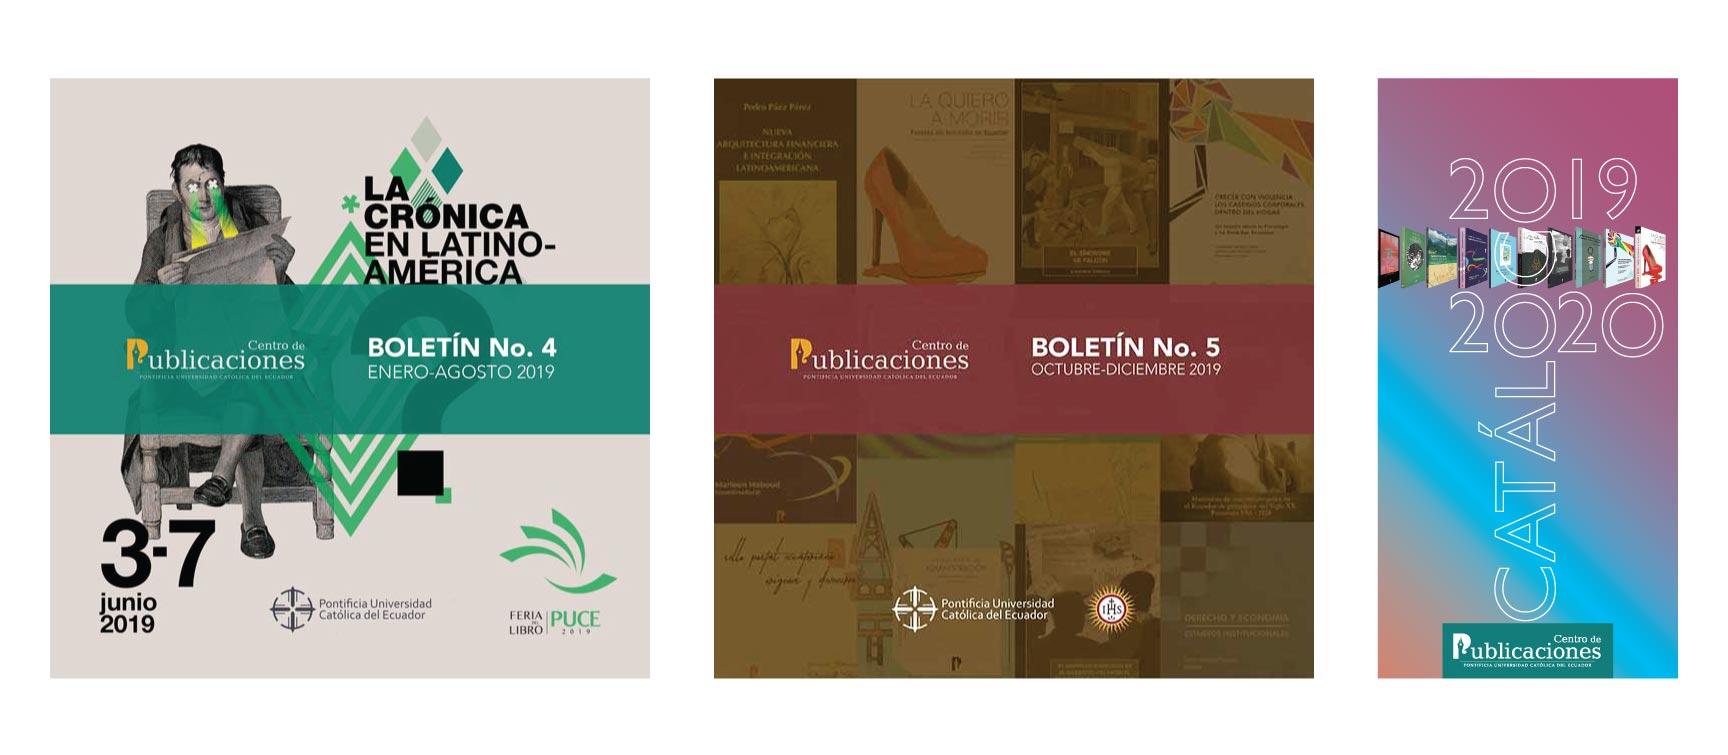 Catálogos y boletines